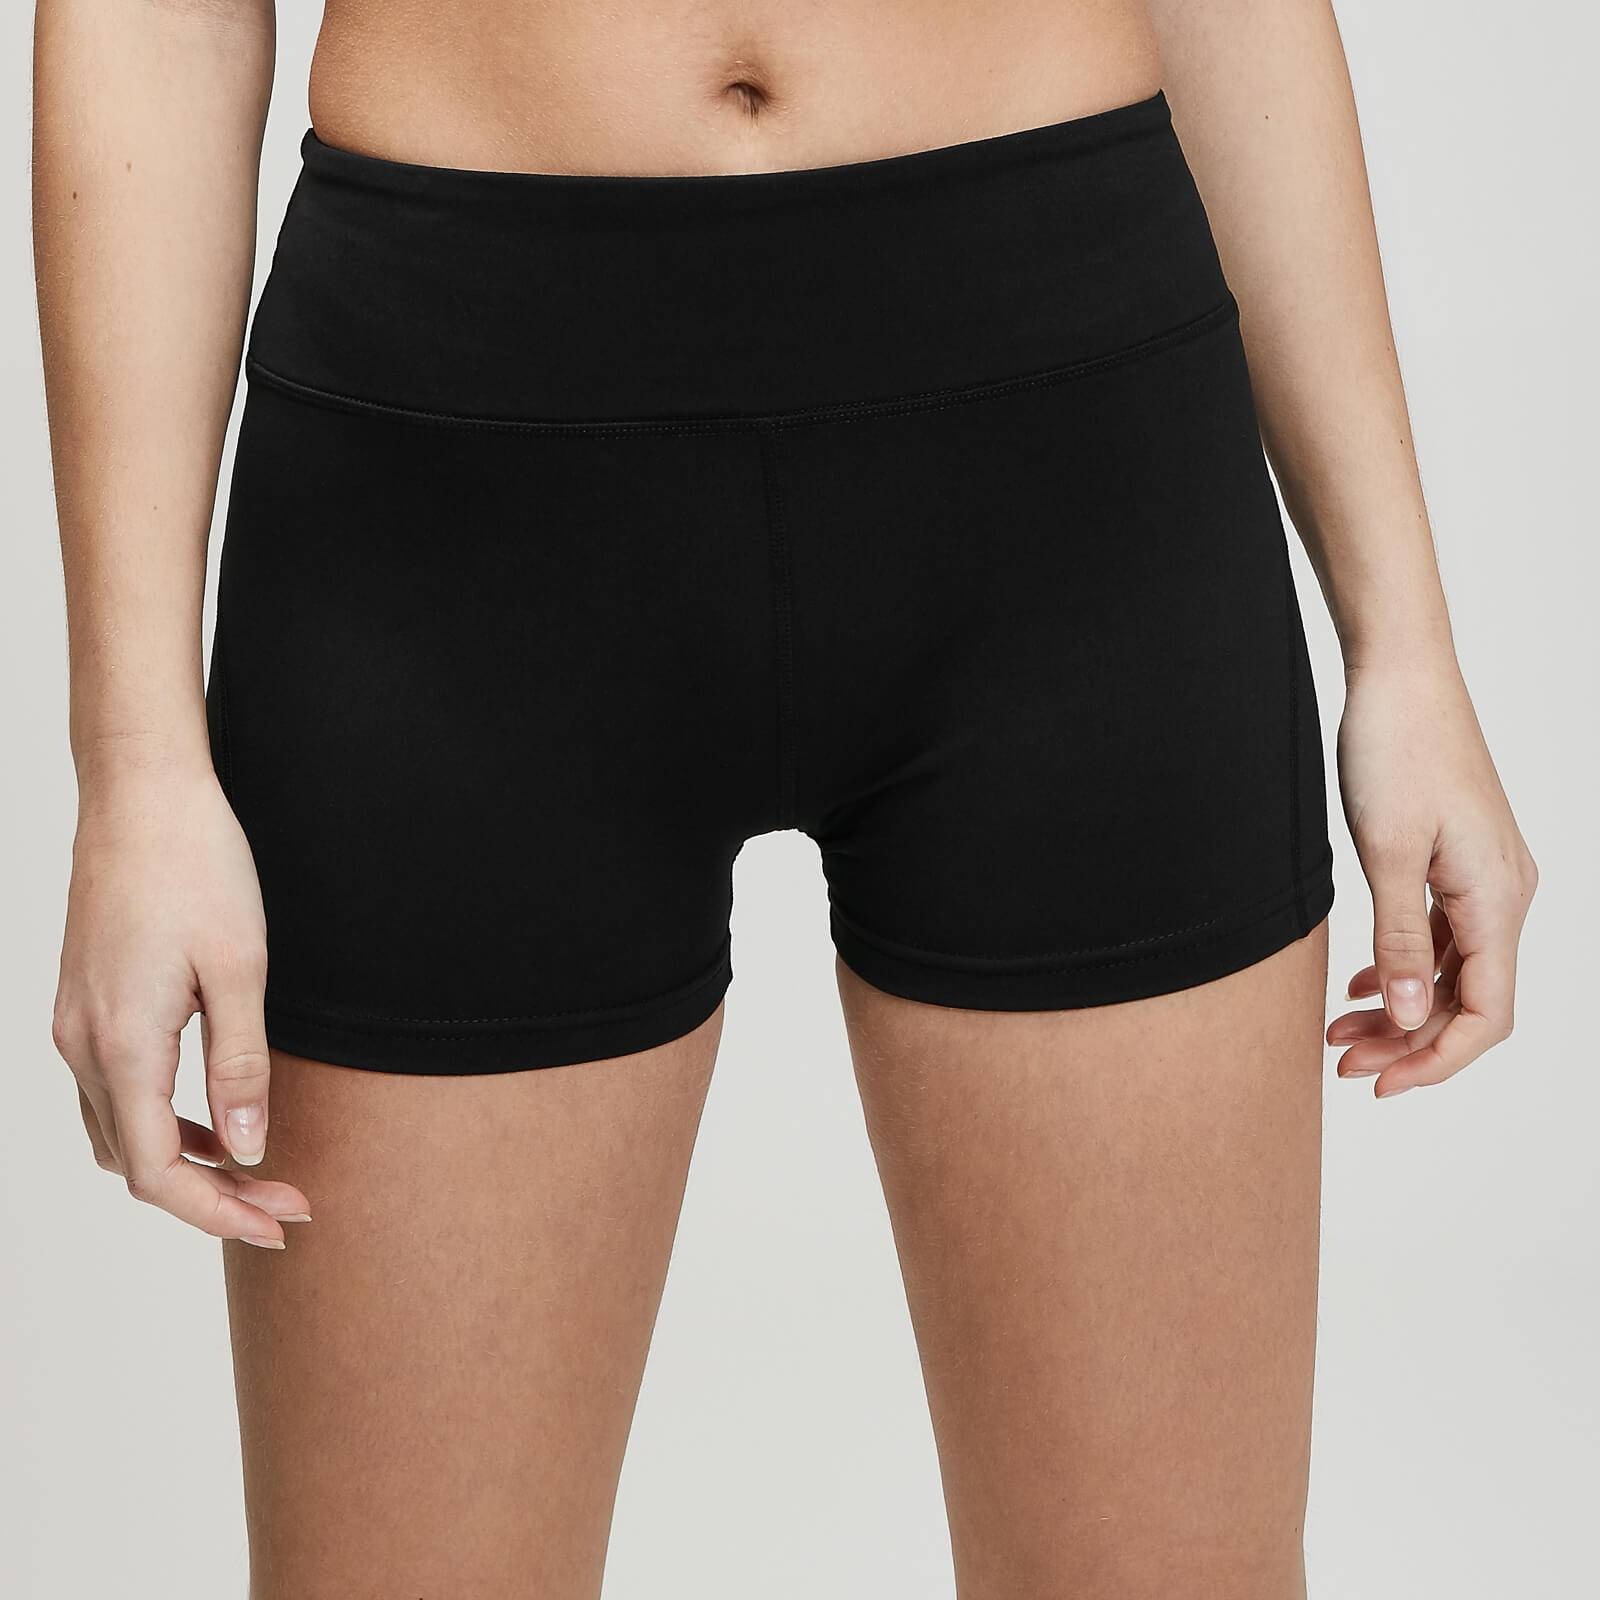 MP Women's Power Shorts - Black - L